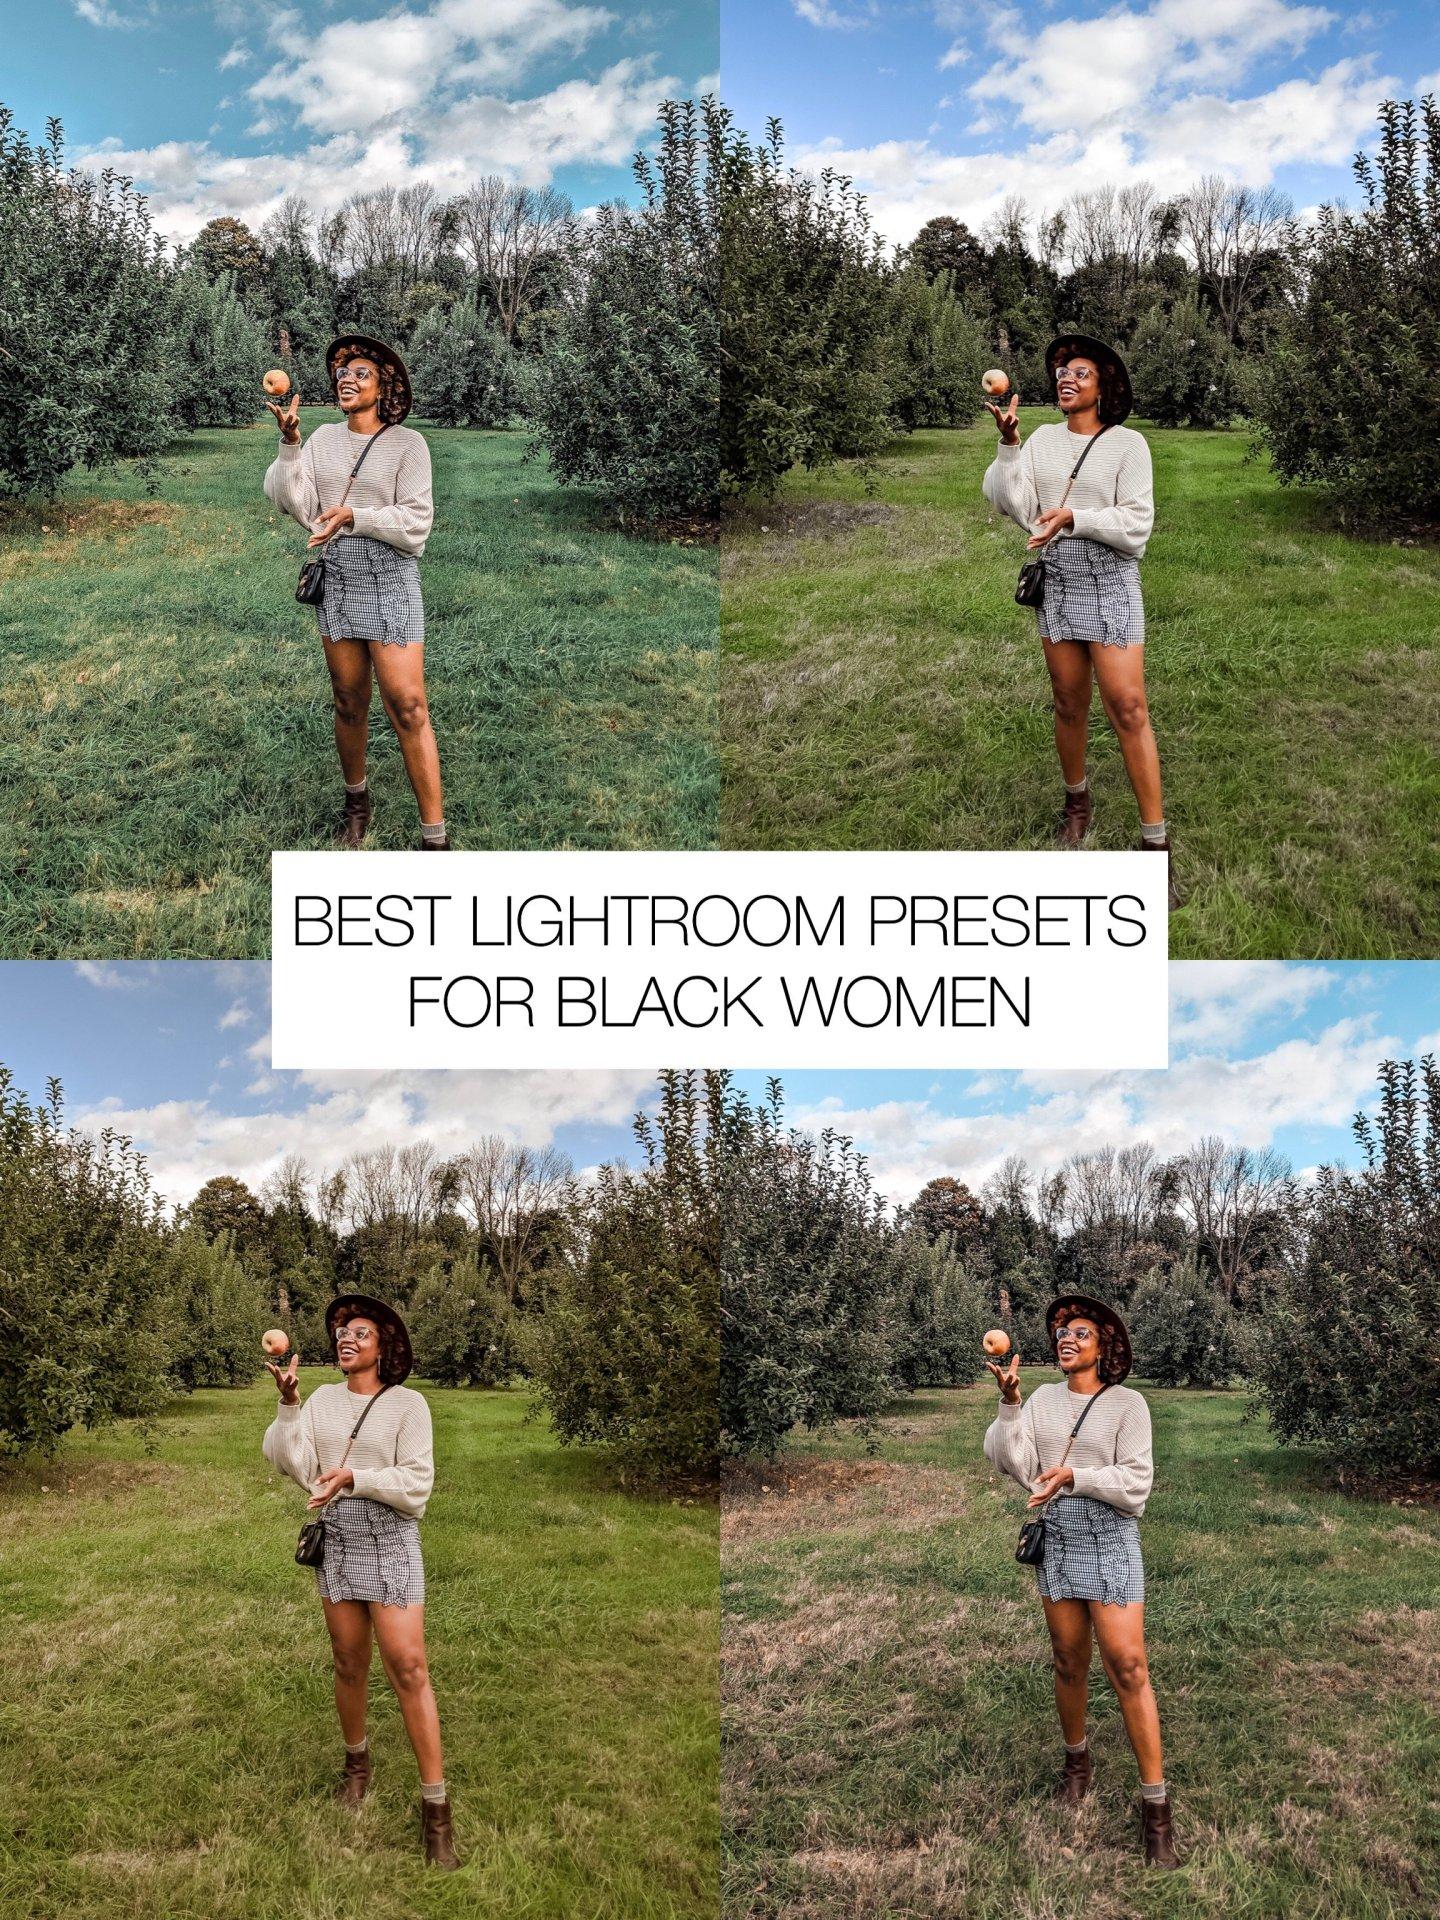 Favorite Lightroom Presets for Black Women - Ijeoma Kola